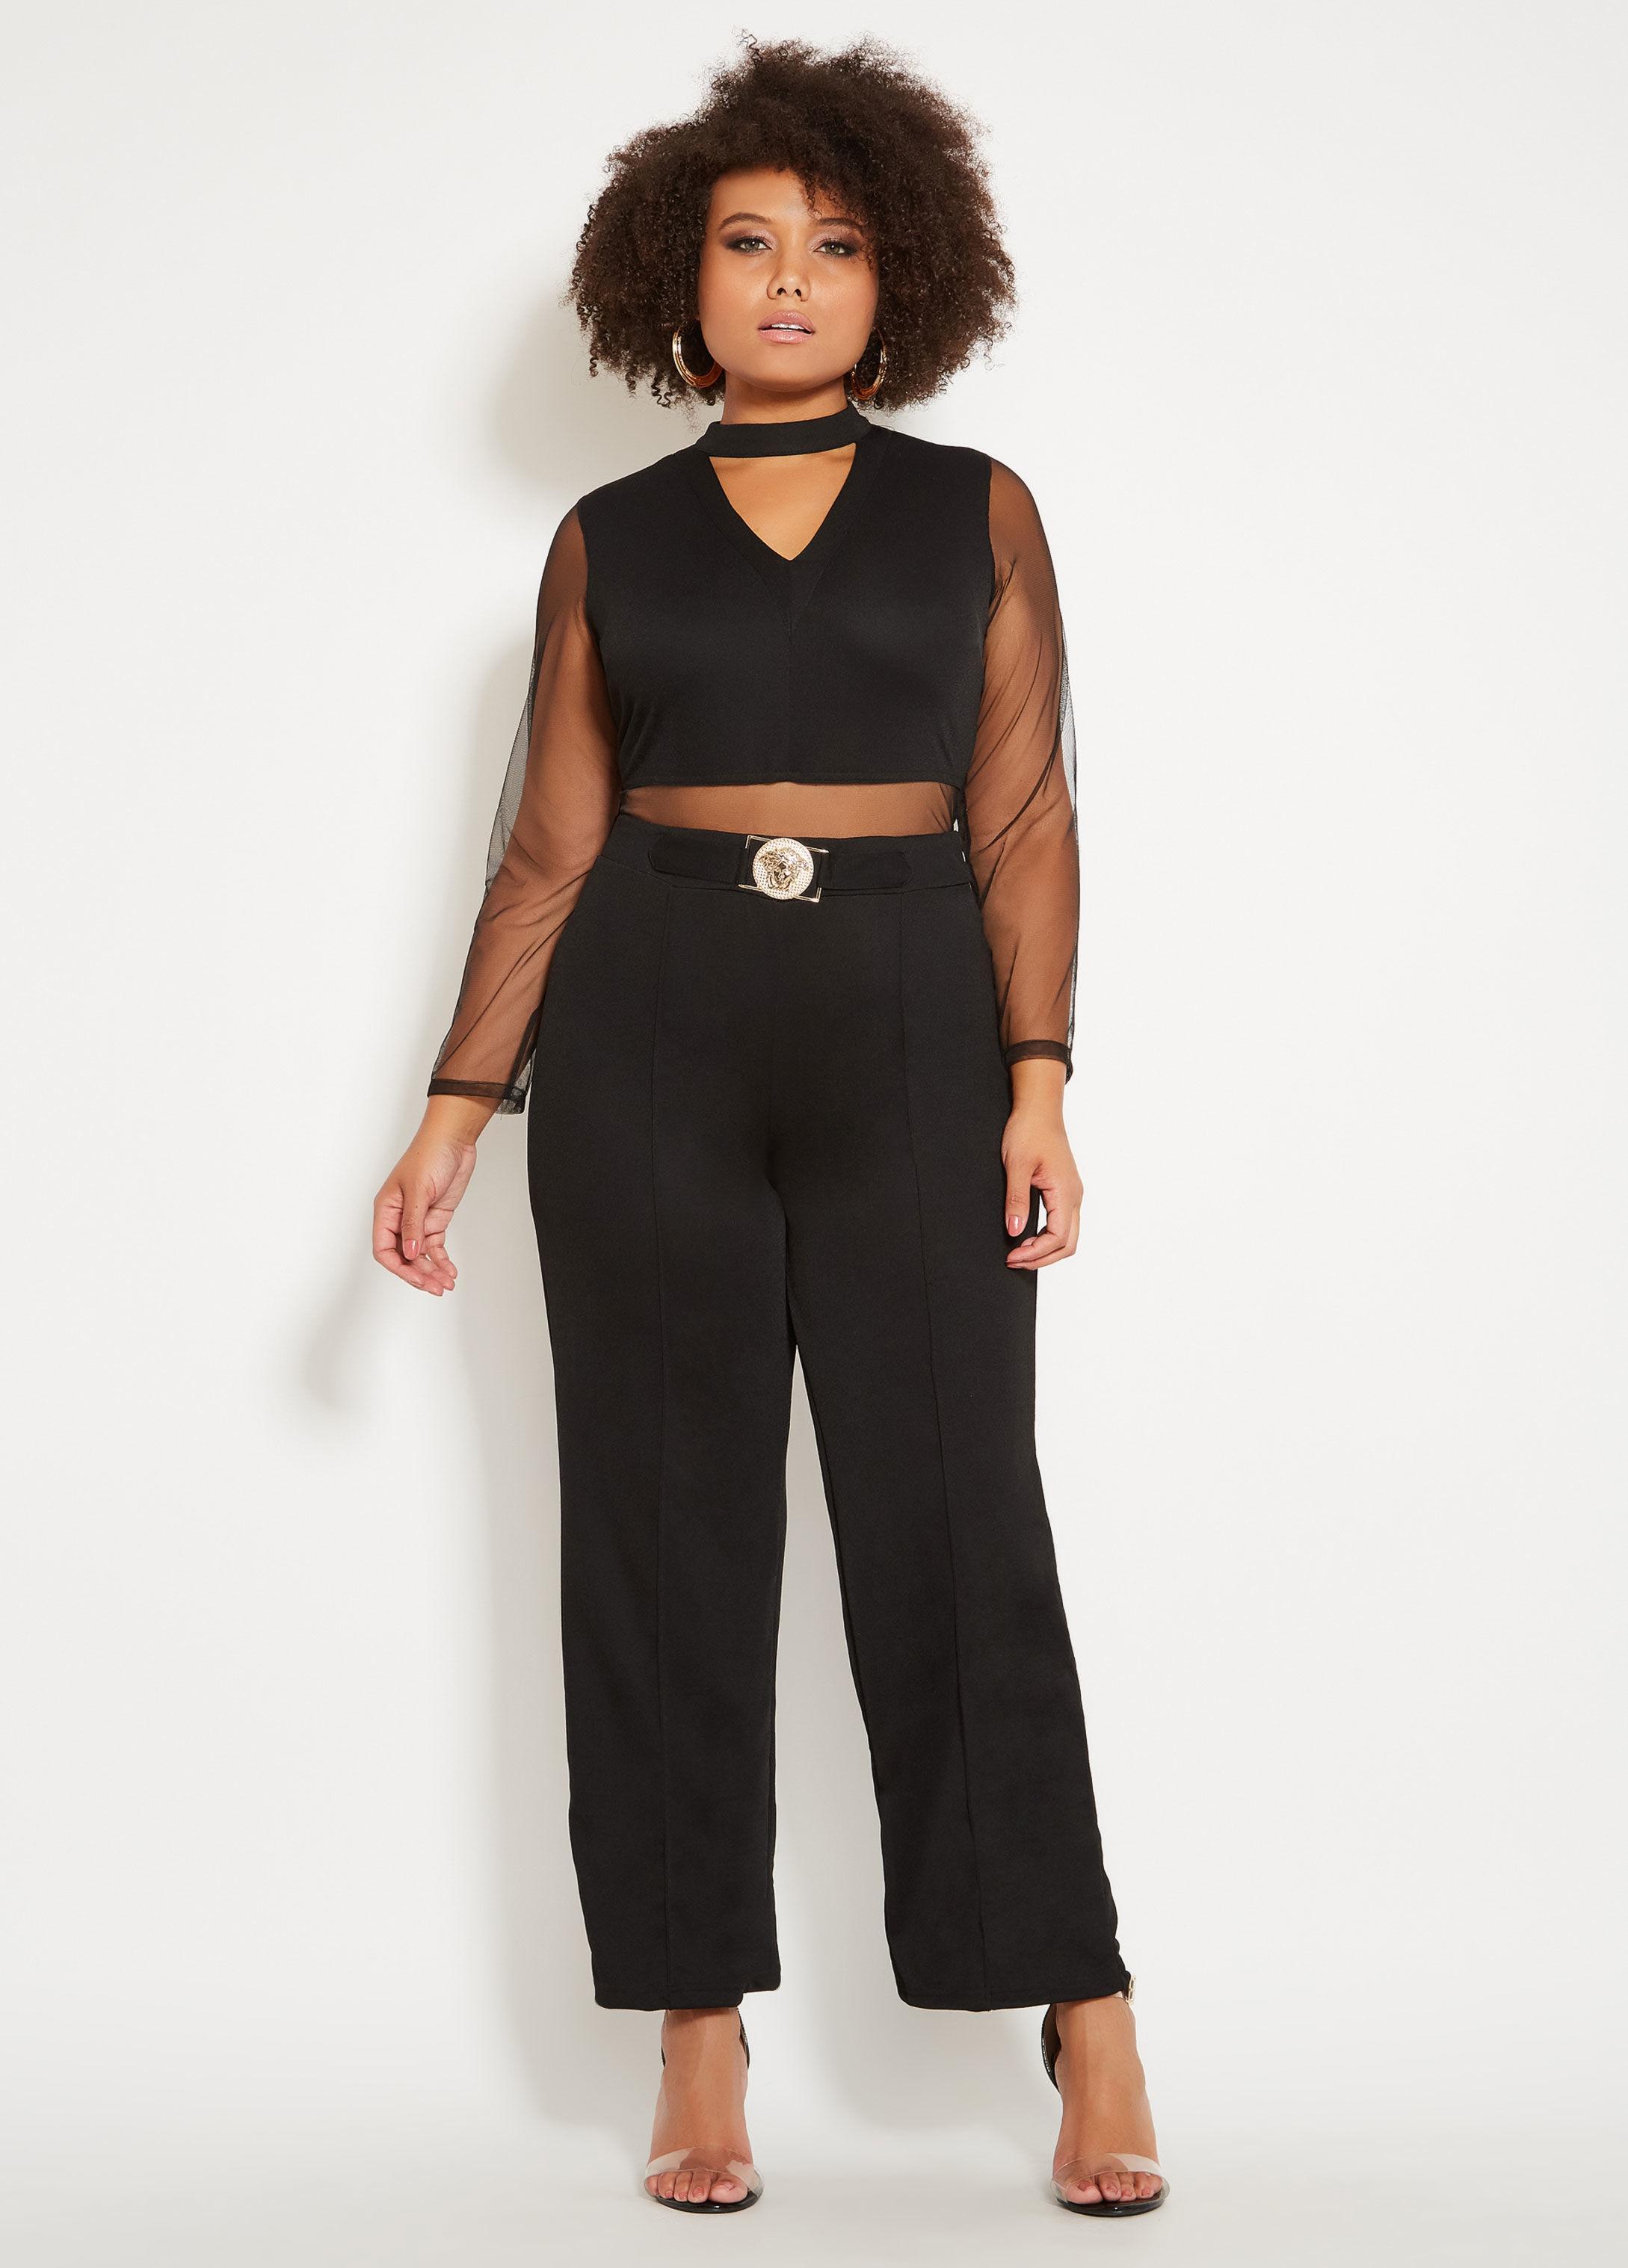 a0855d6b5ca23 Lyst - Ashley Stewart Plus Size Mesh Gold Belt Jumpsuit in Black